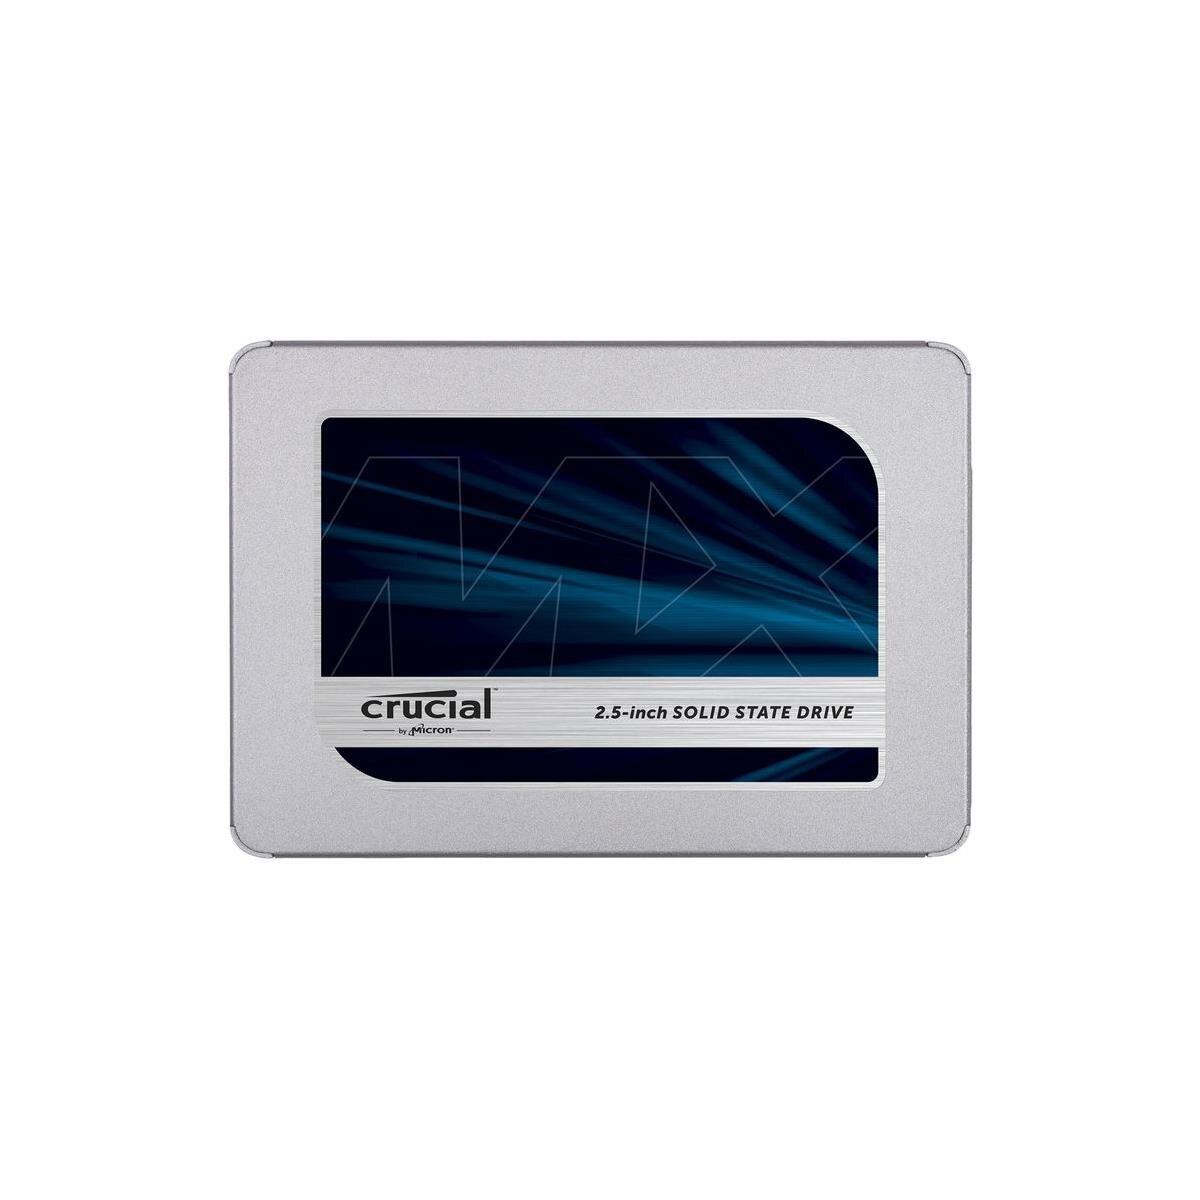 "Crucial mx500 1tb 2.5"" internal ssd $91.8"